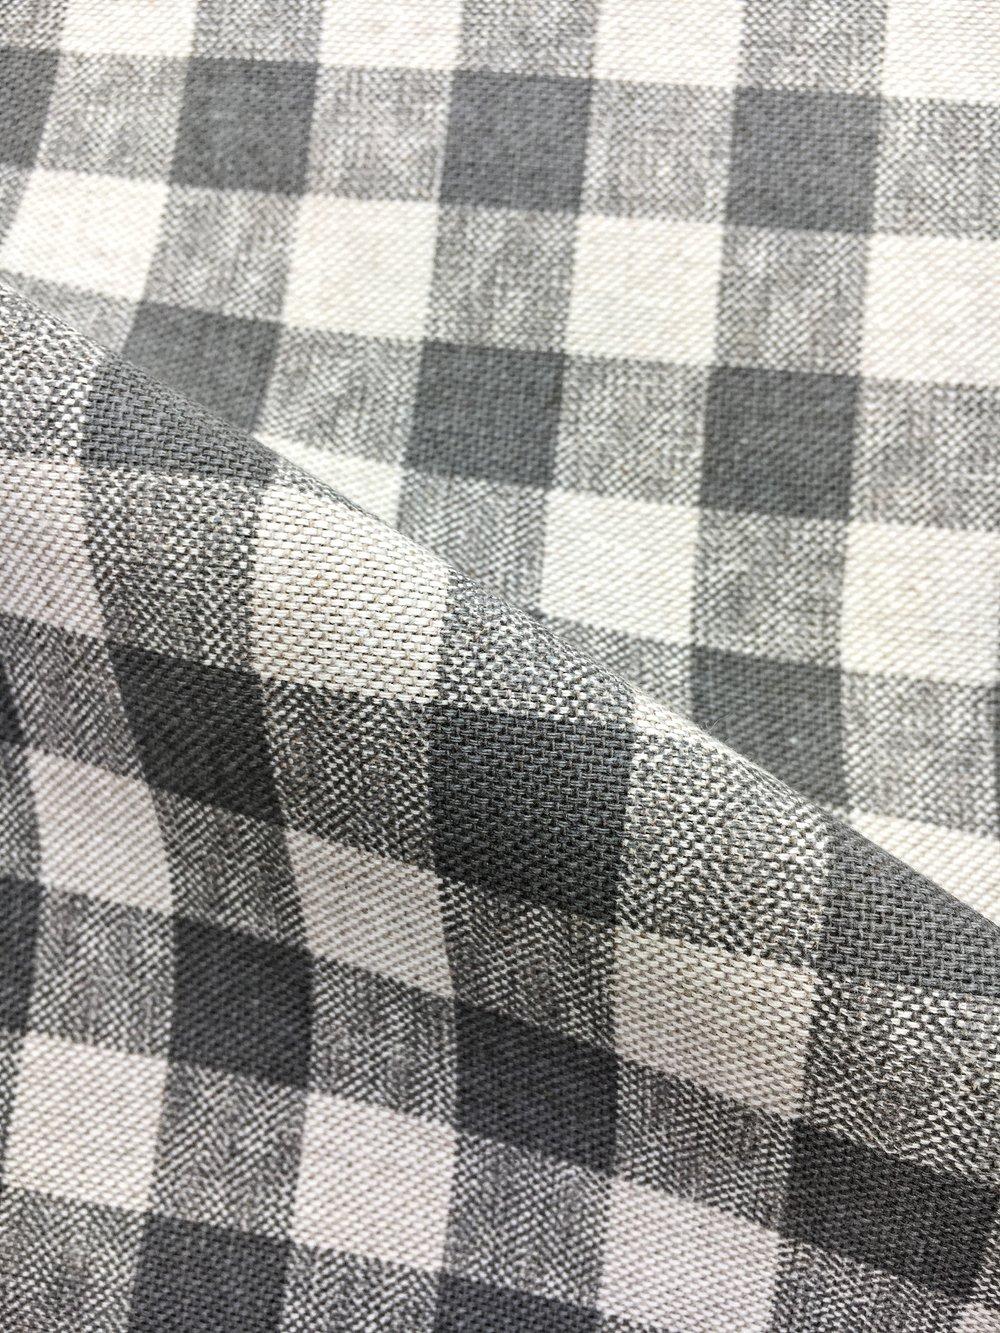 CottonFabricWGCheckers4.jpg